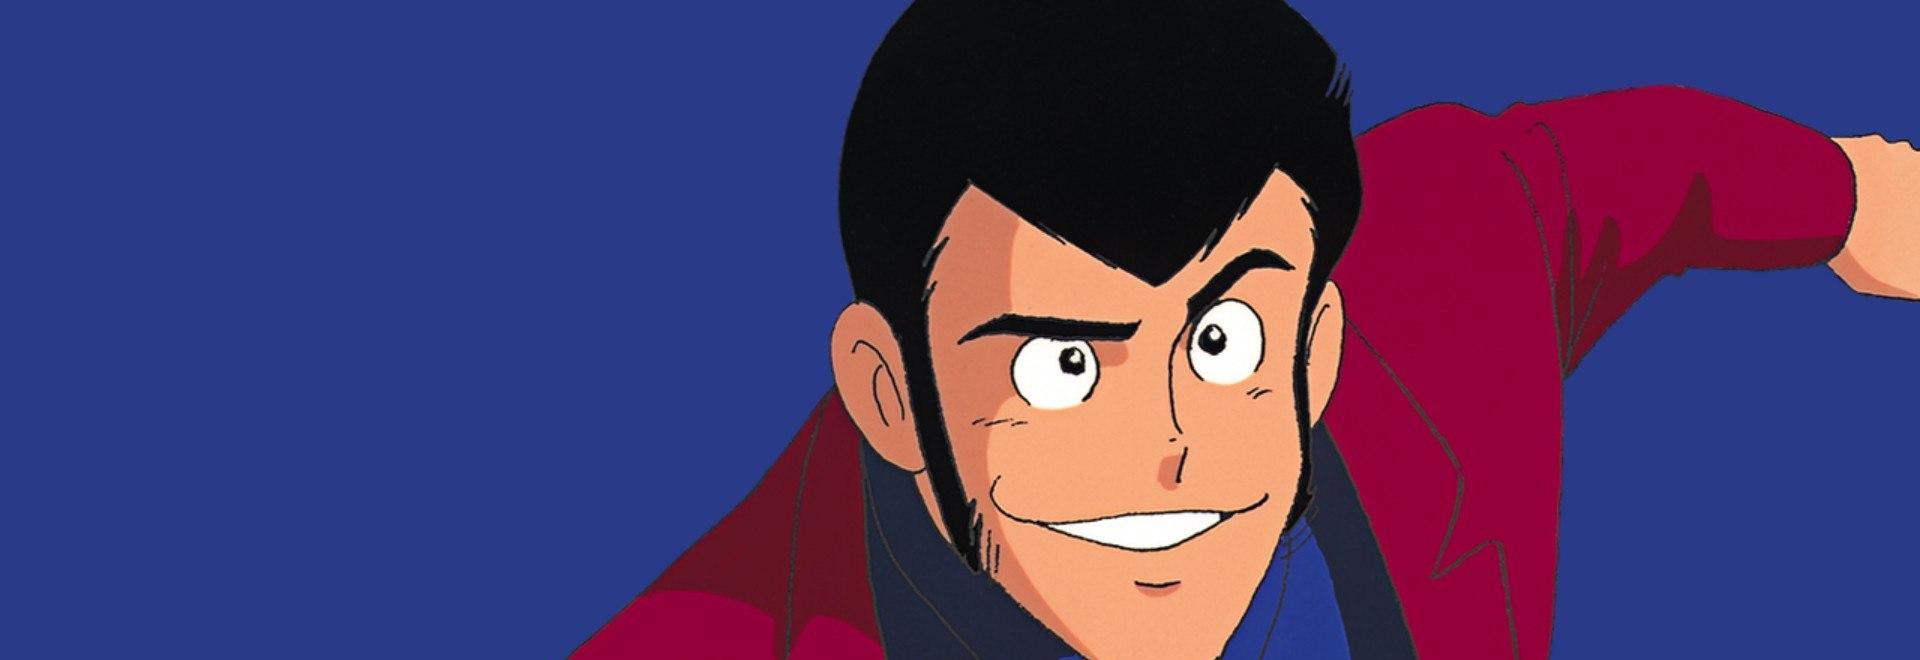 Lupin in trappola